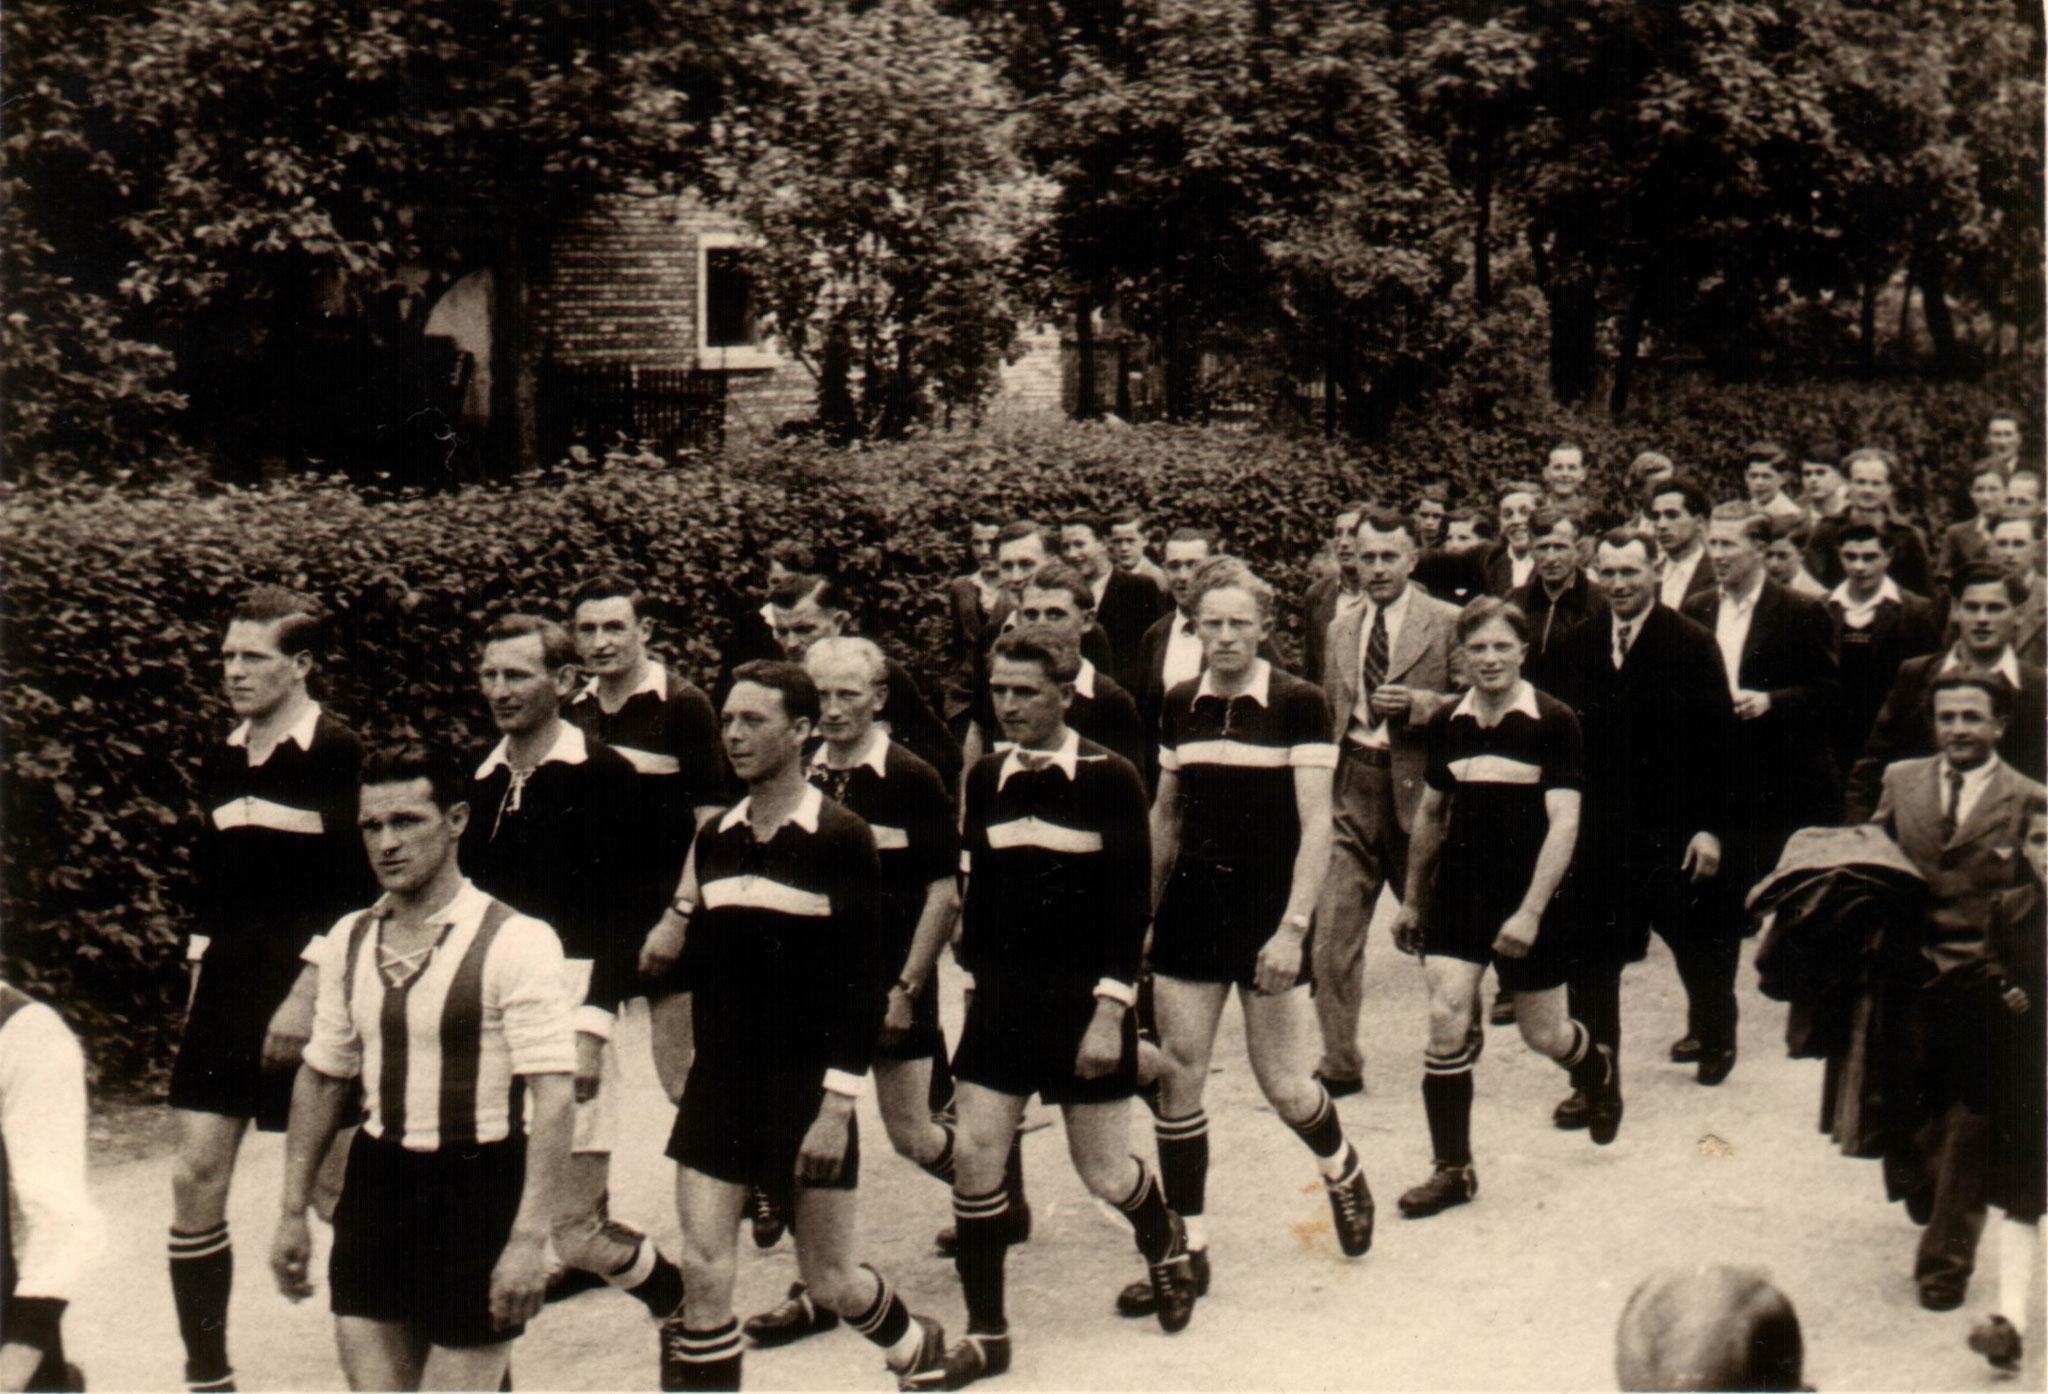 Sportfest 1949 -  2 Mannschaft -   Umzug durchs Dorf